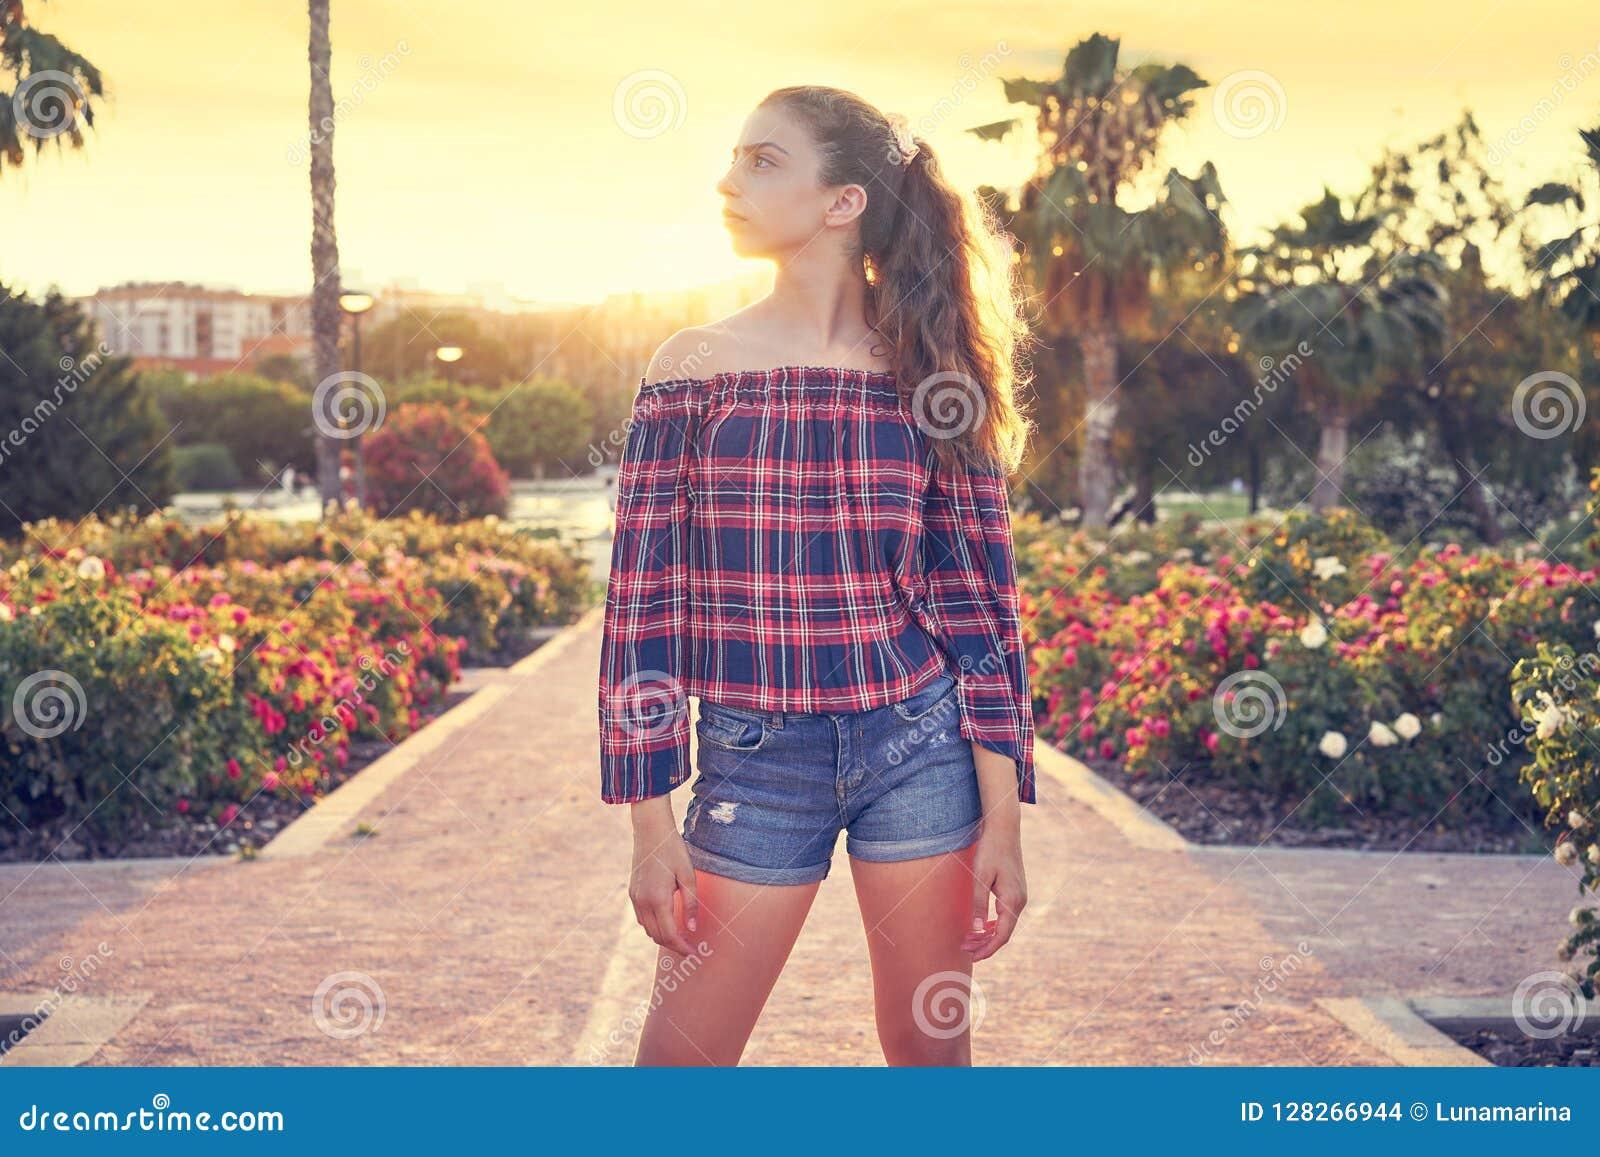 Girl posing in a flowers park garden